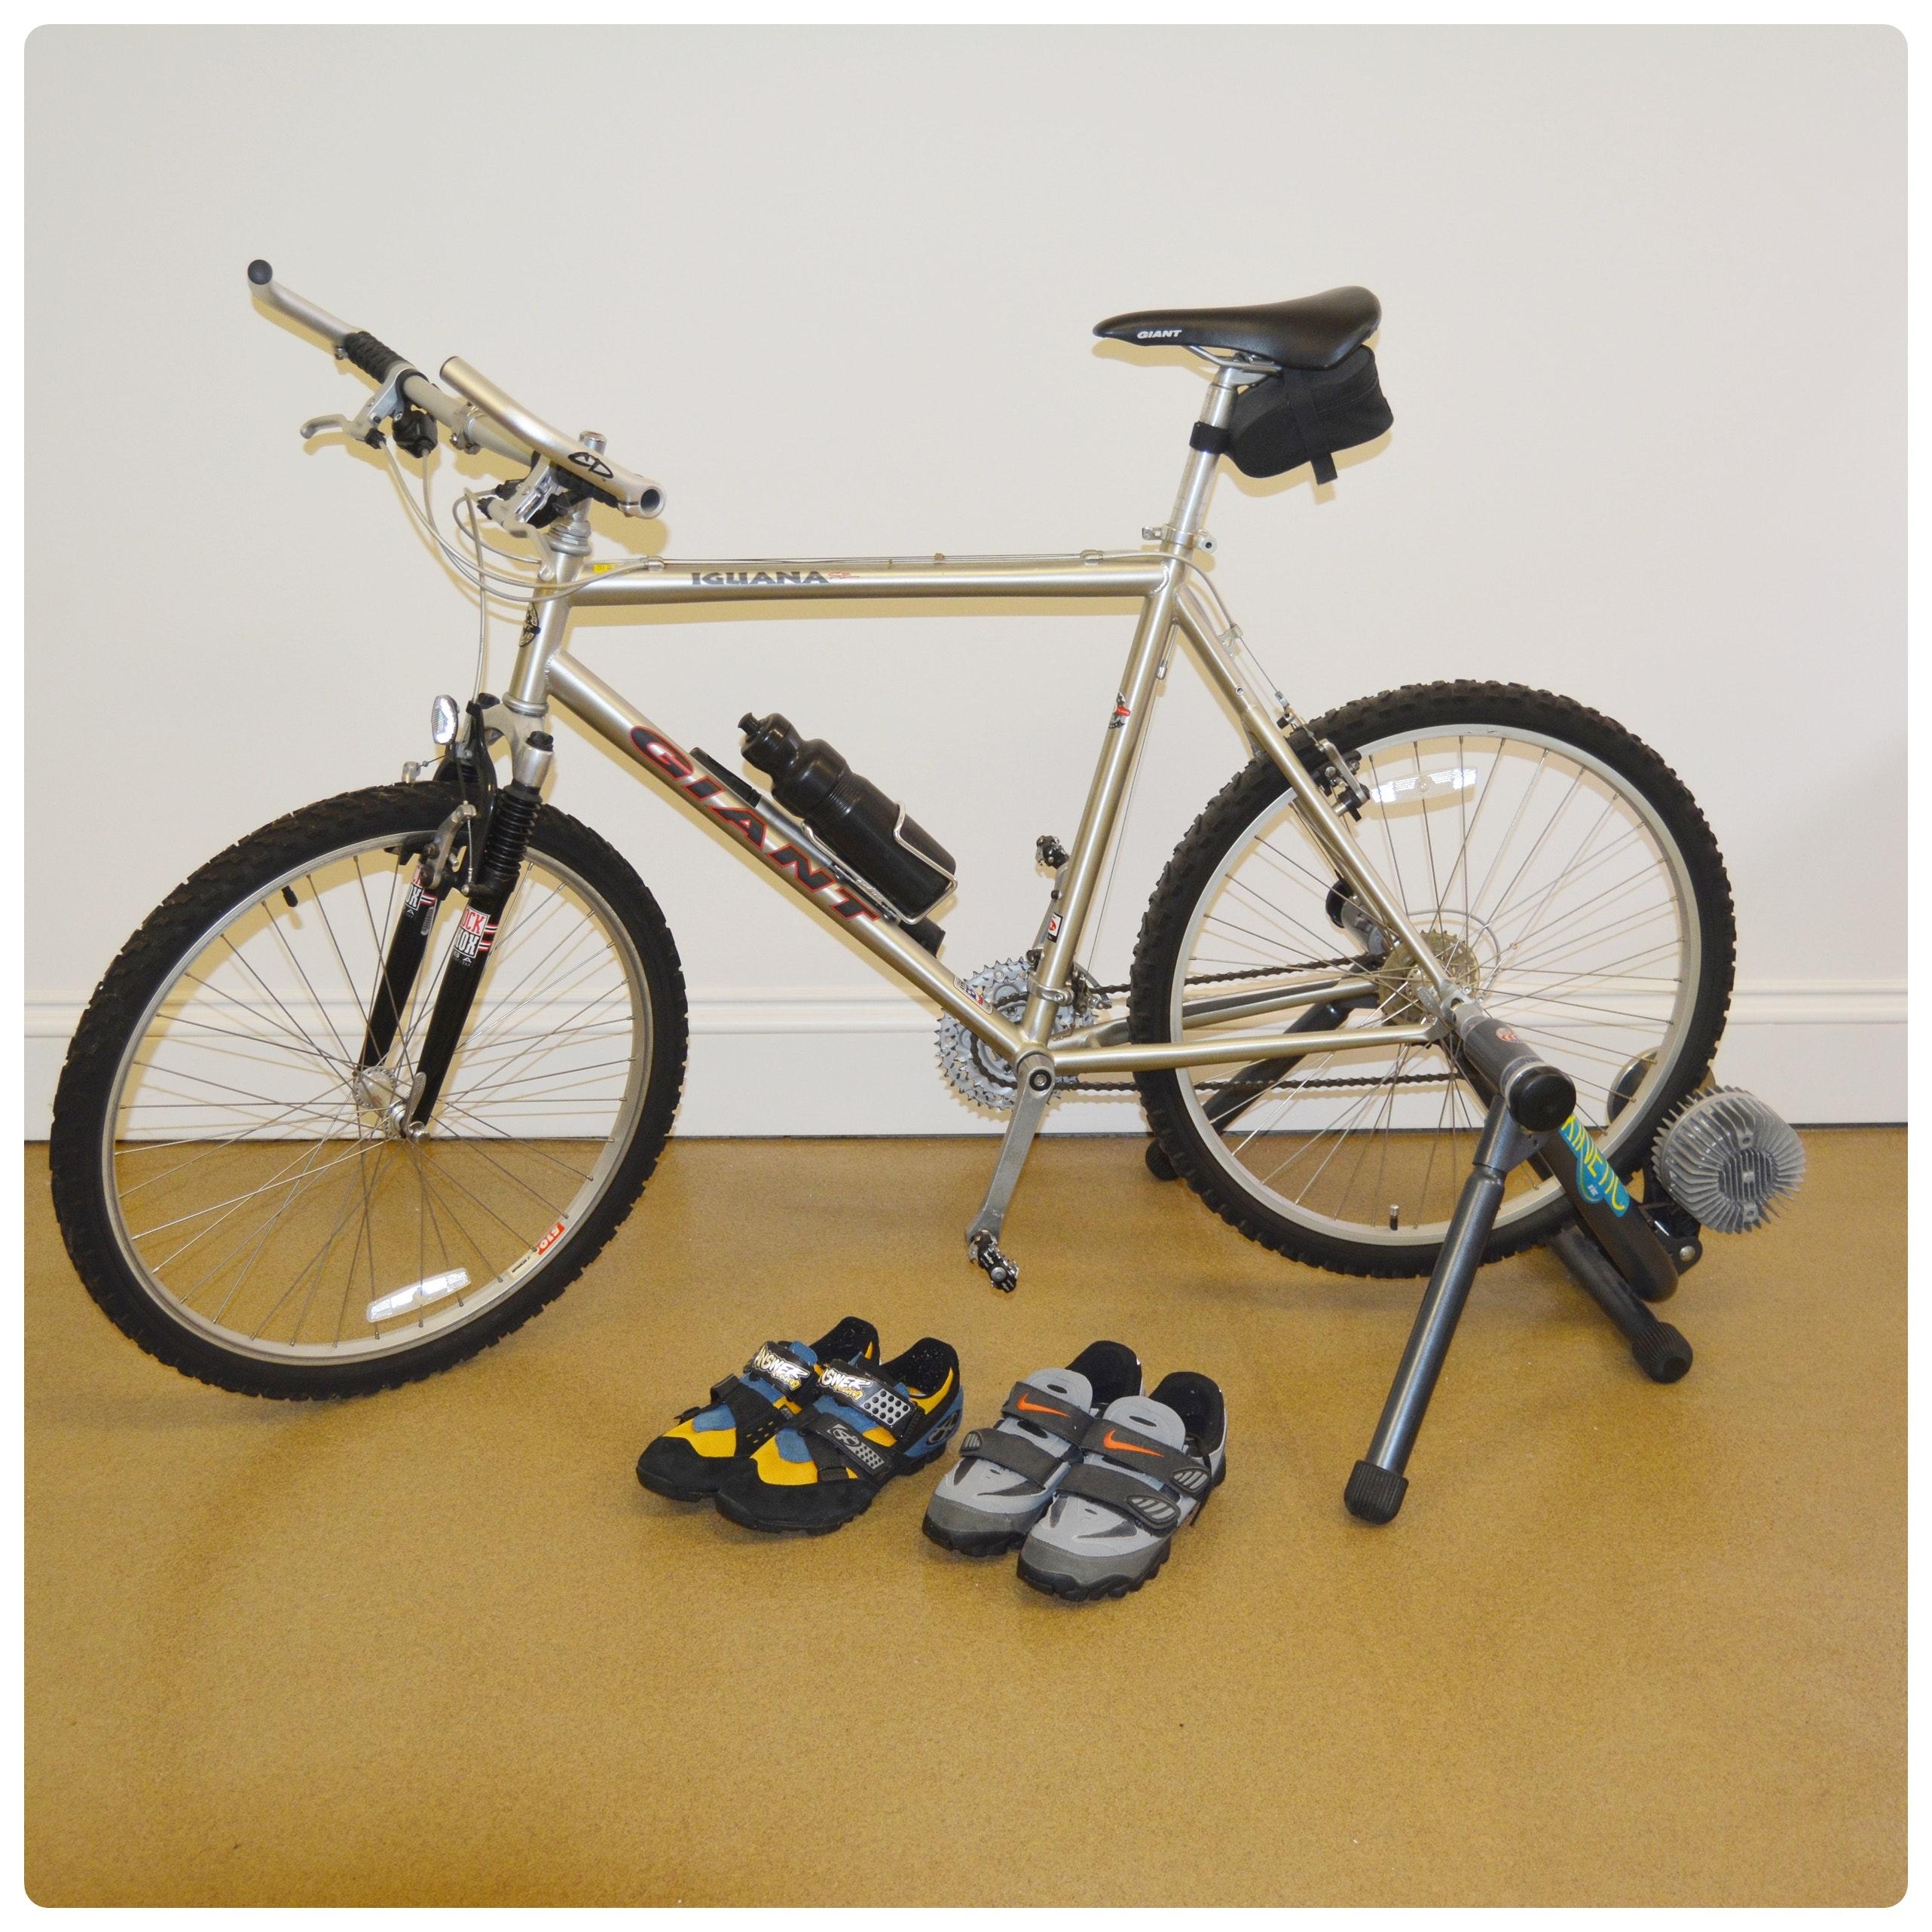 "Giant Iguana 21.5"" Bike, Bike Resistance Trainer and Bike Shoes"